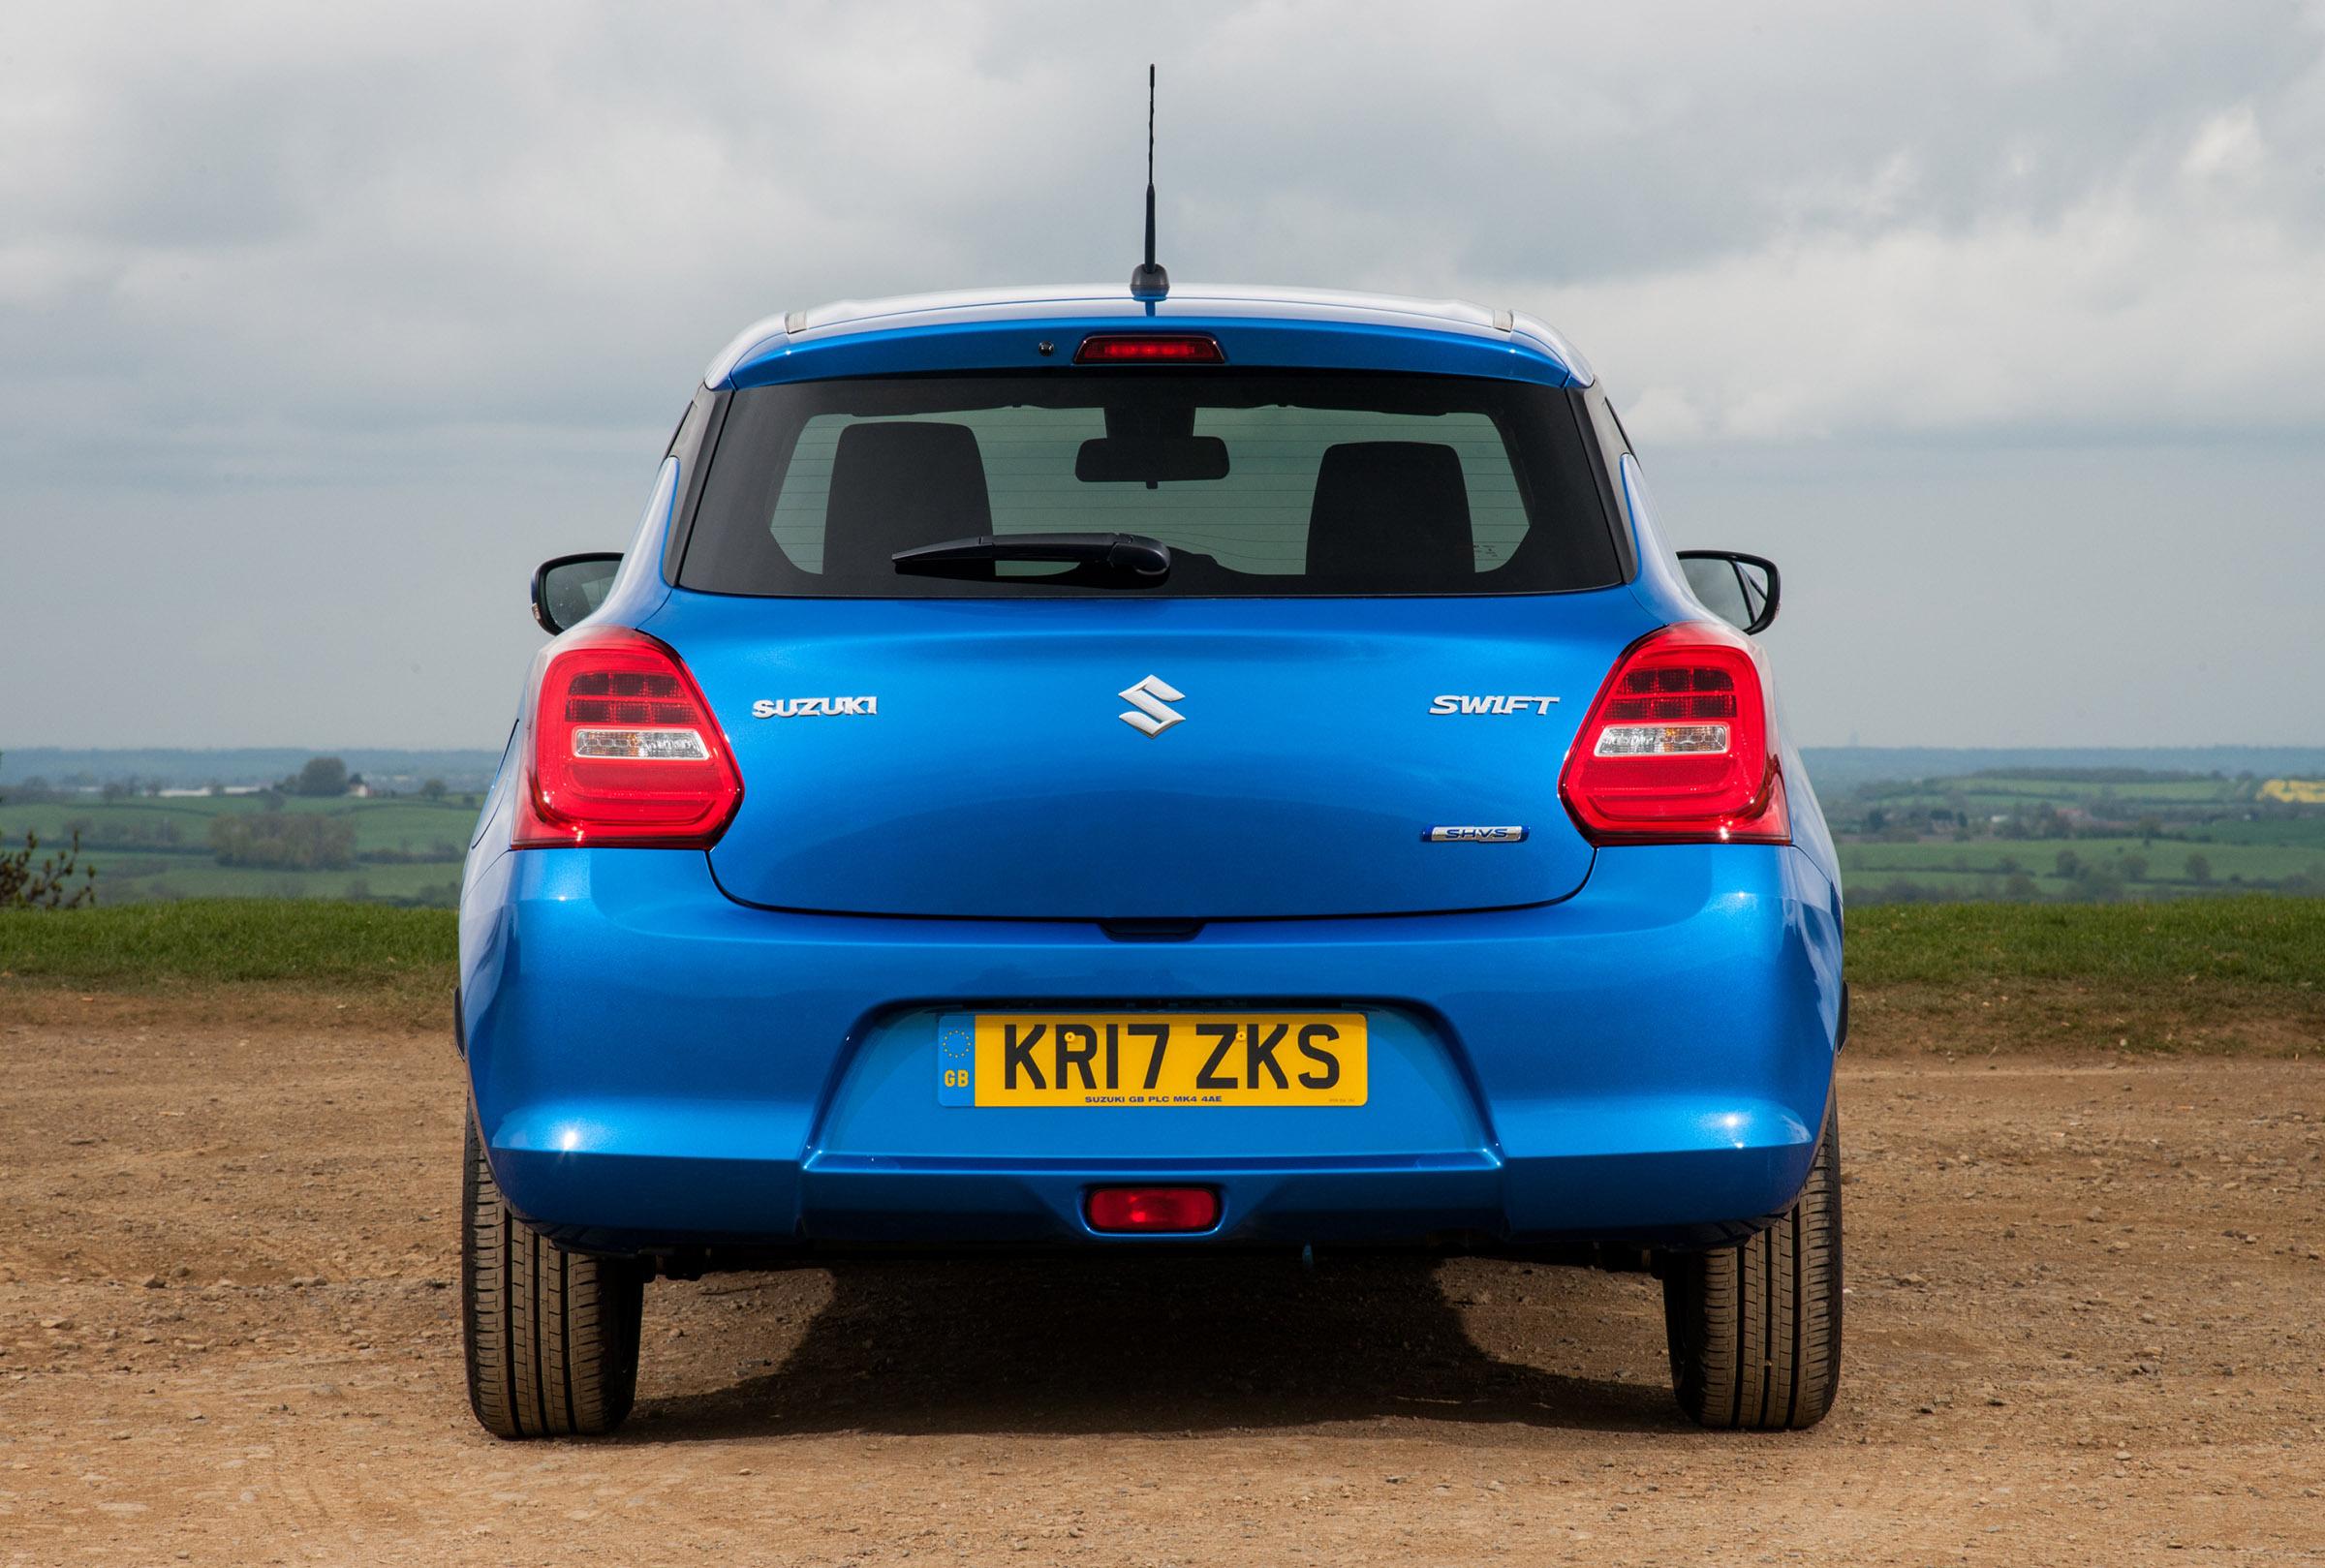 Suzuki Swift review - More fun than a Fiesta? | Evo